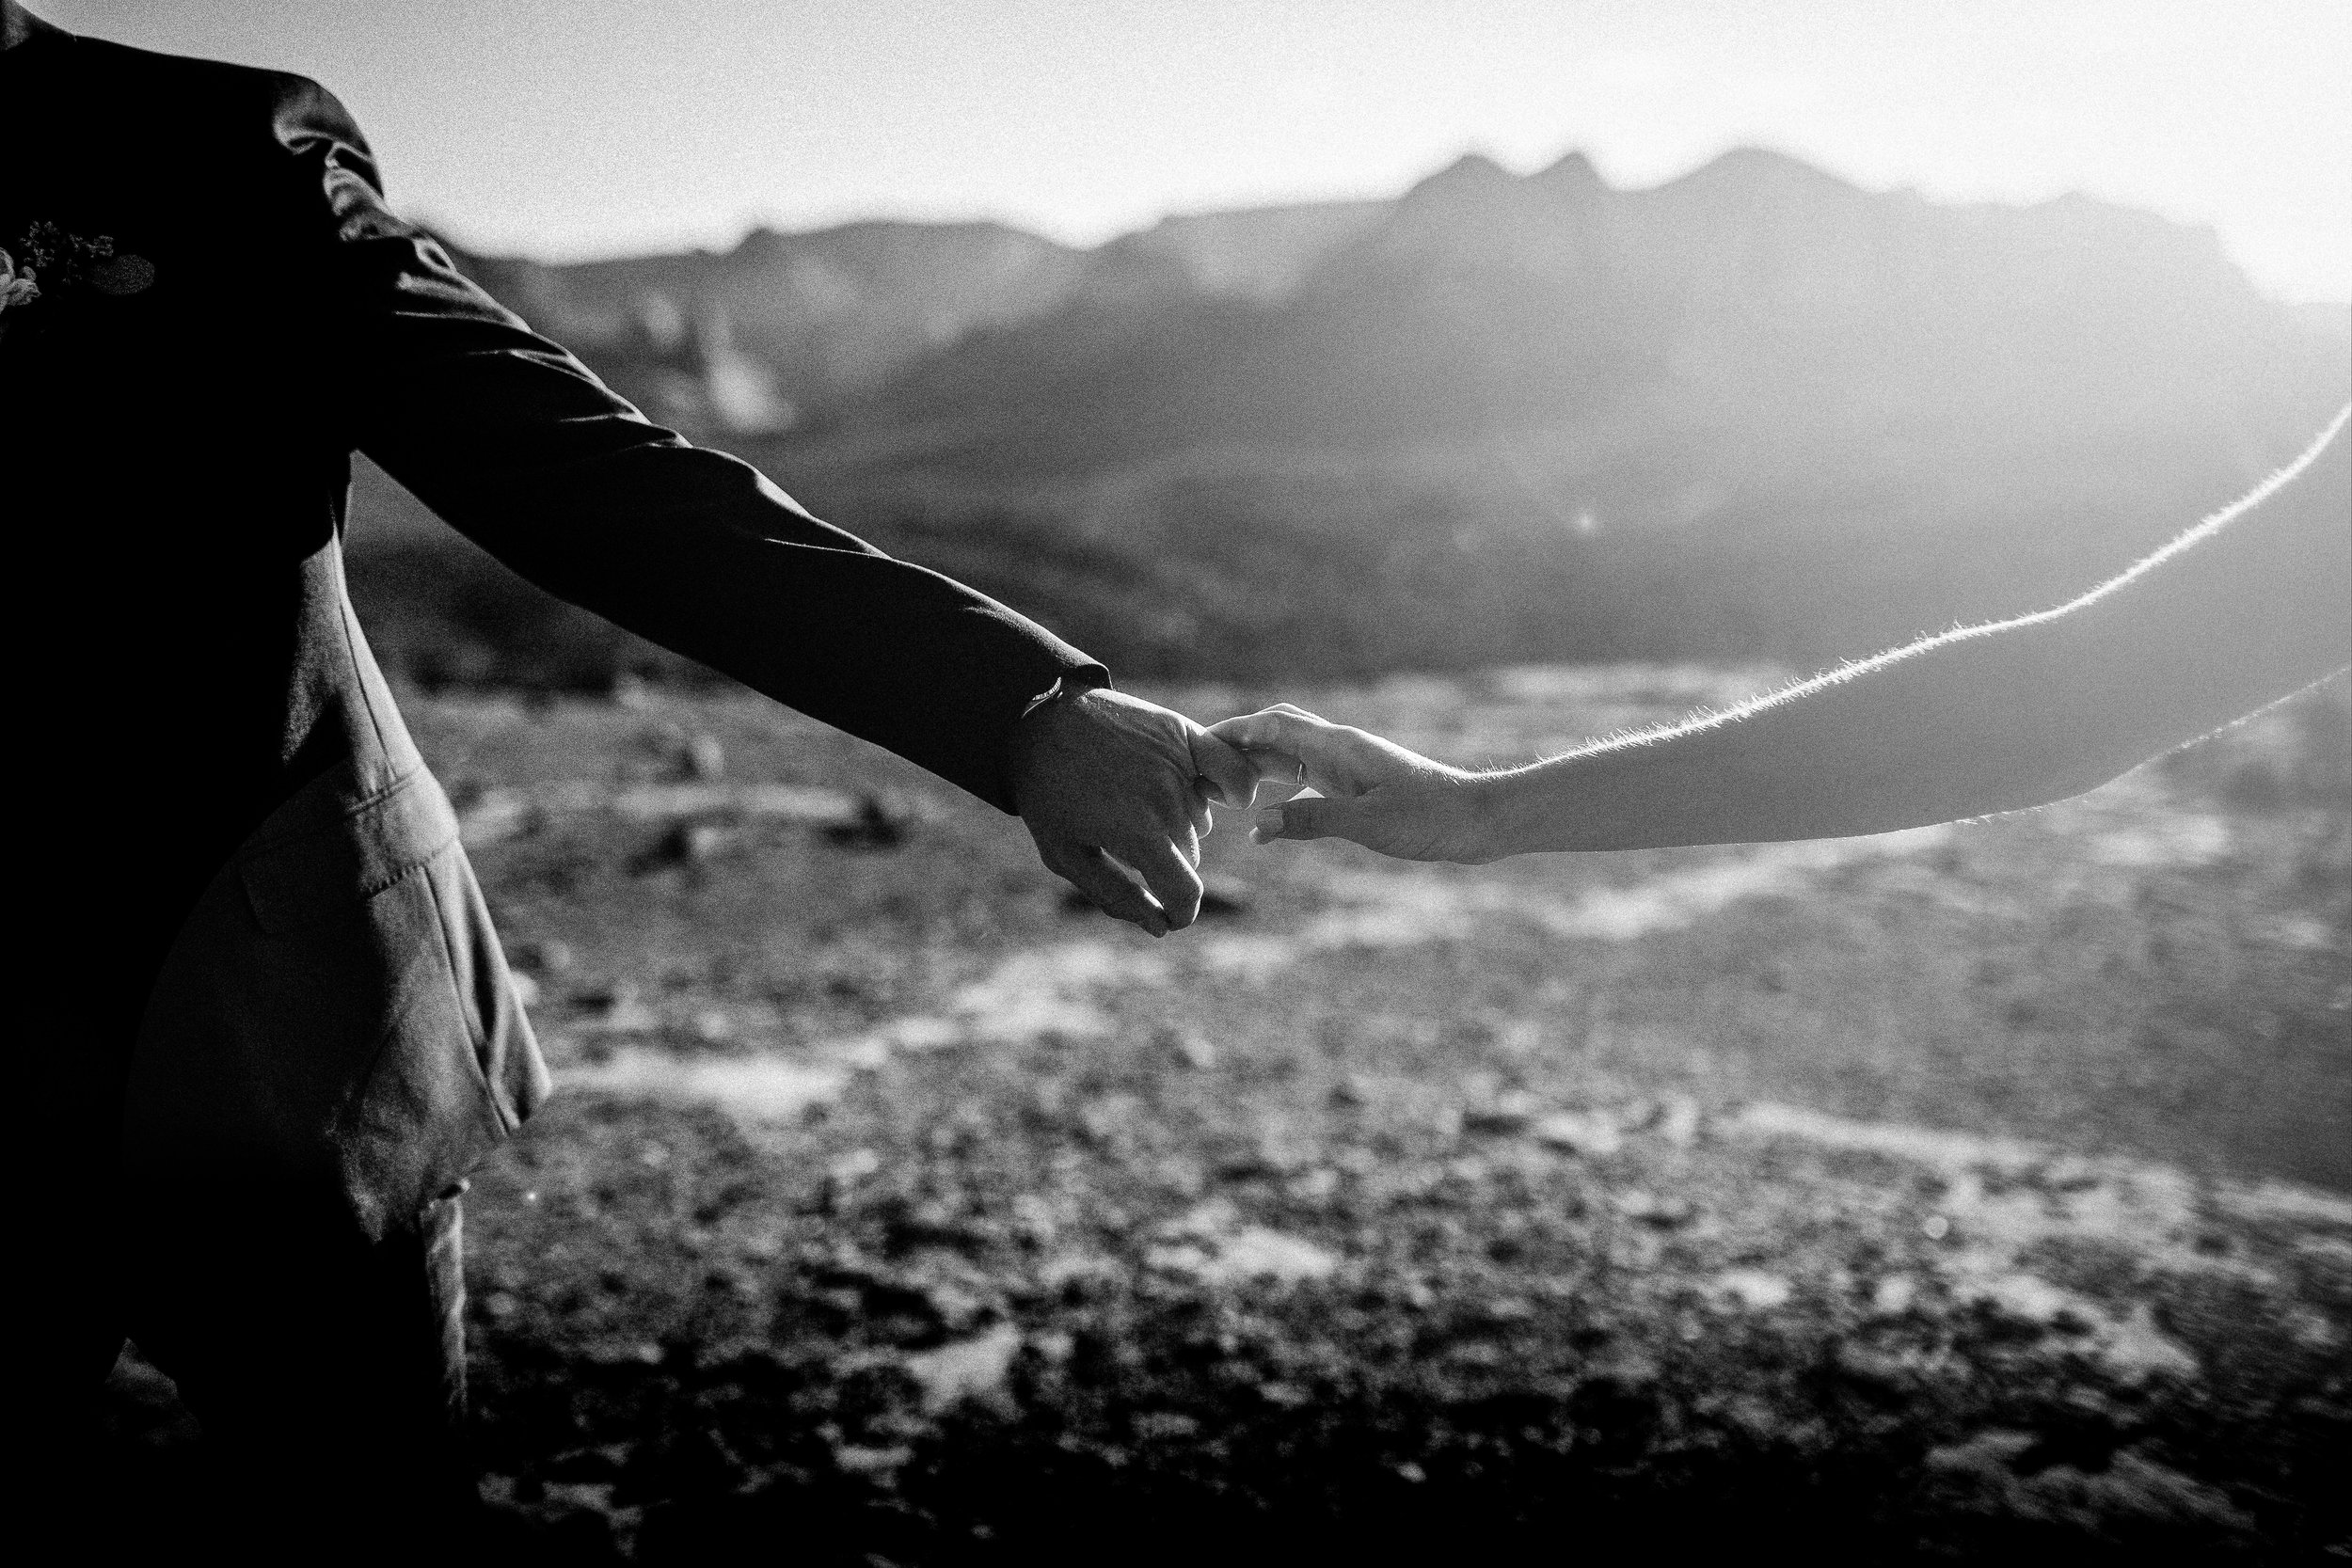 nicole-daacke-photography-sedona-arizona-destination-elopement-wedding-photographer-catherdral-rock-hiking-elopement-sedona-river-elopement-photos-desert-rock-wedding-photographer-laid-back-spontaneous-elopement-66.jpg